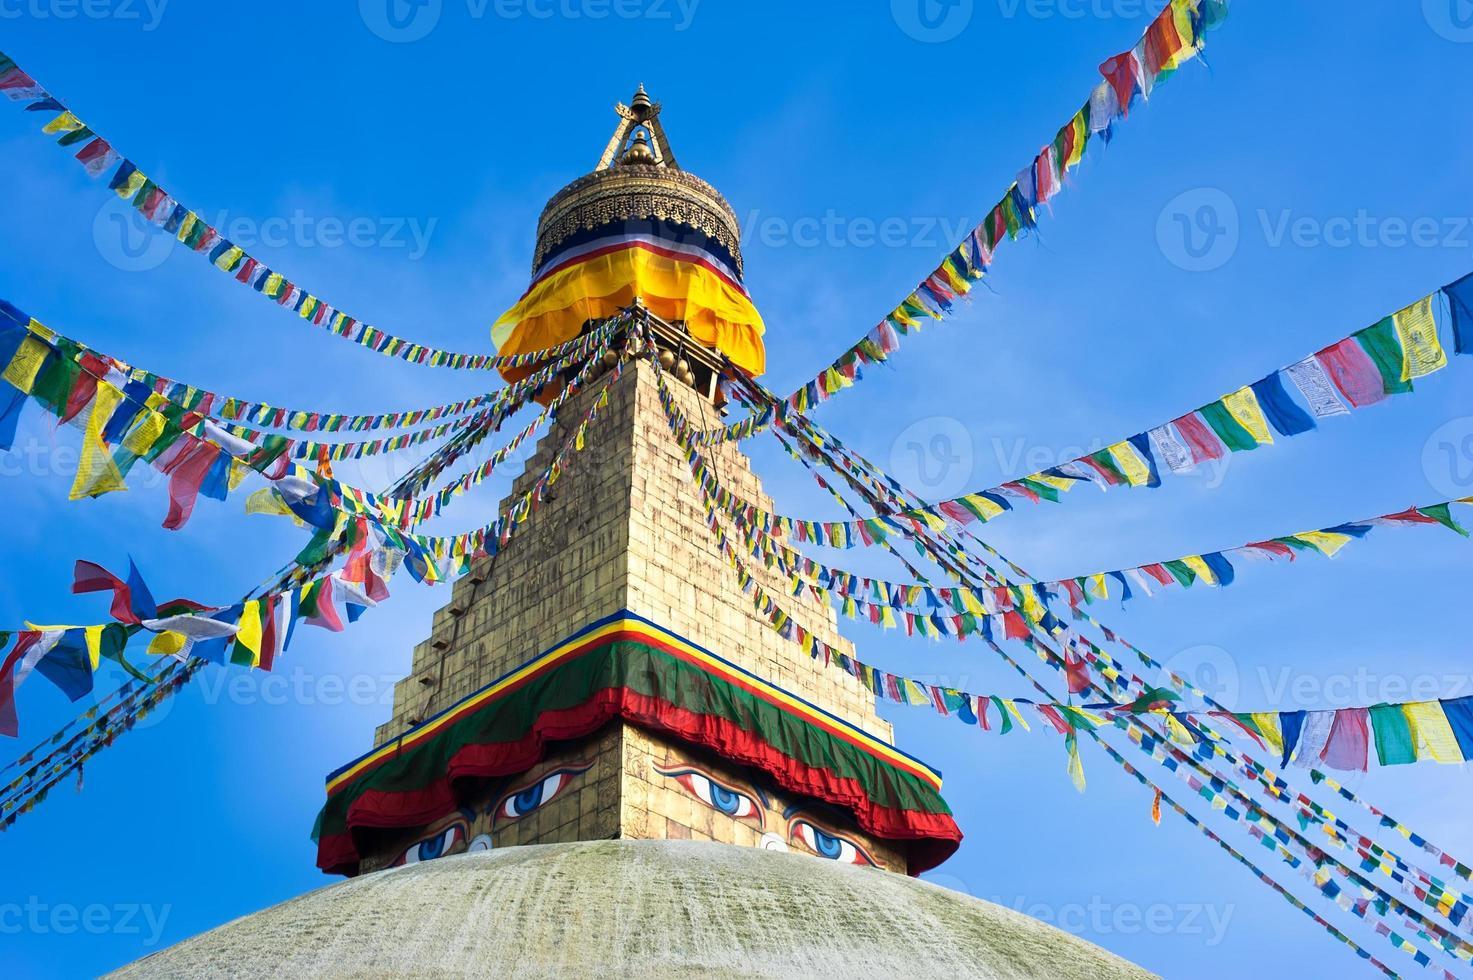 Buddhist Shrine Boudhanath Stupa with pray flags over blue sky photo